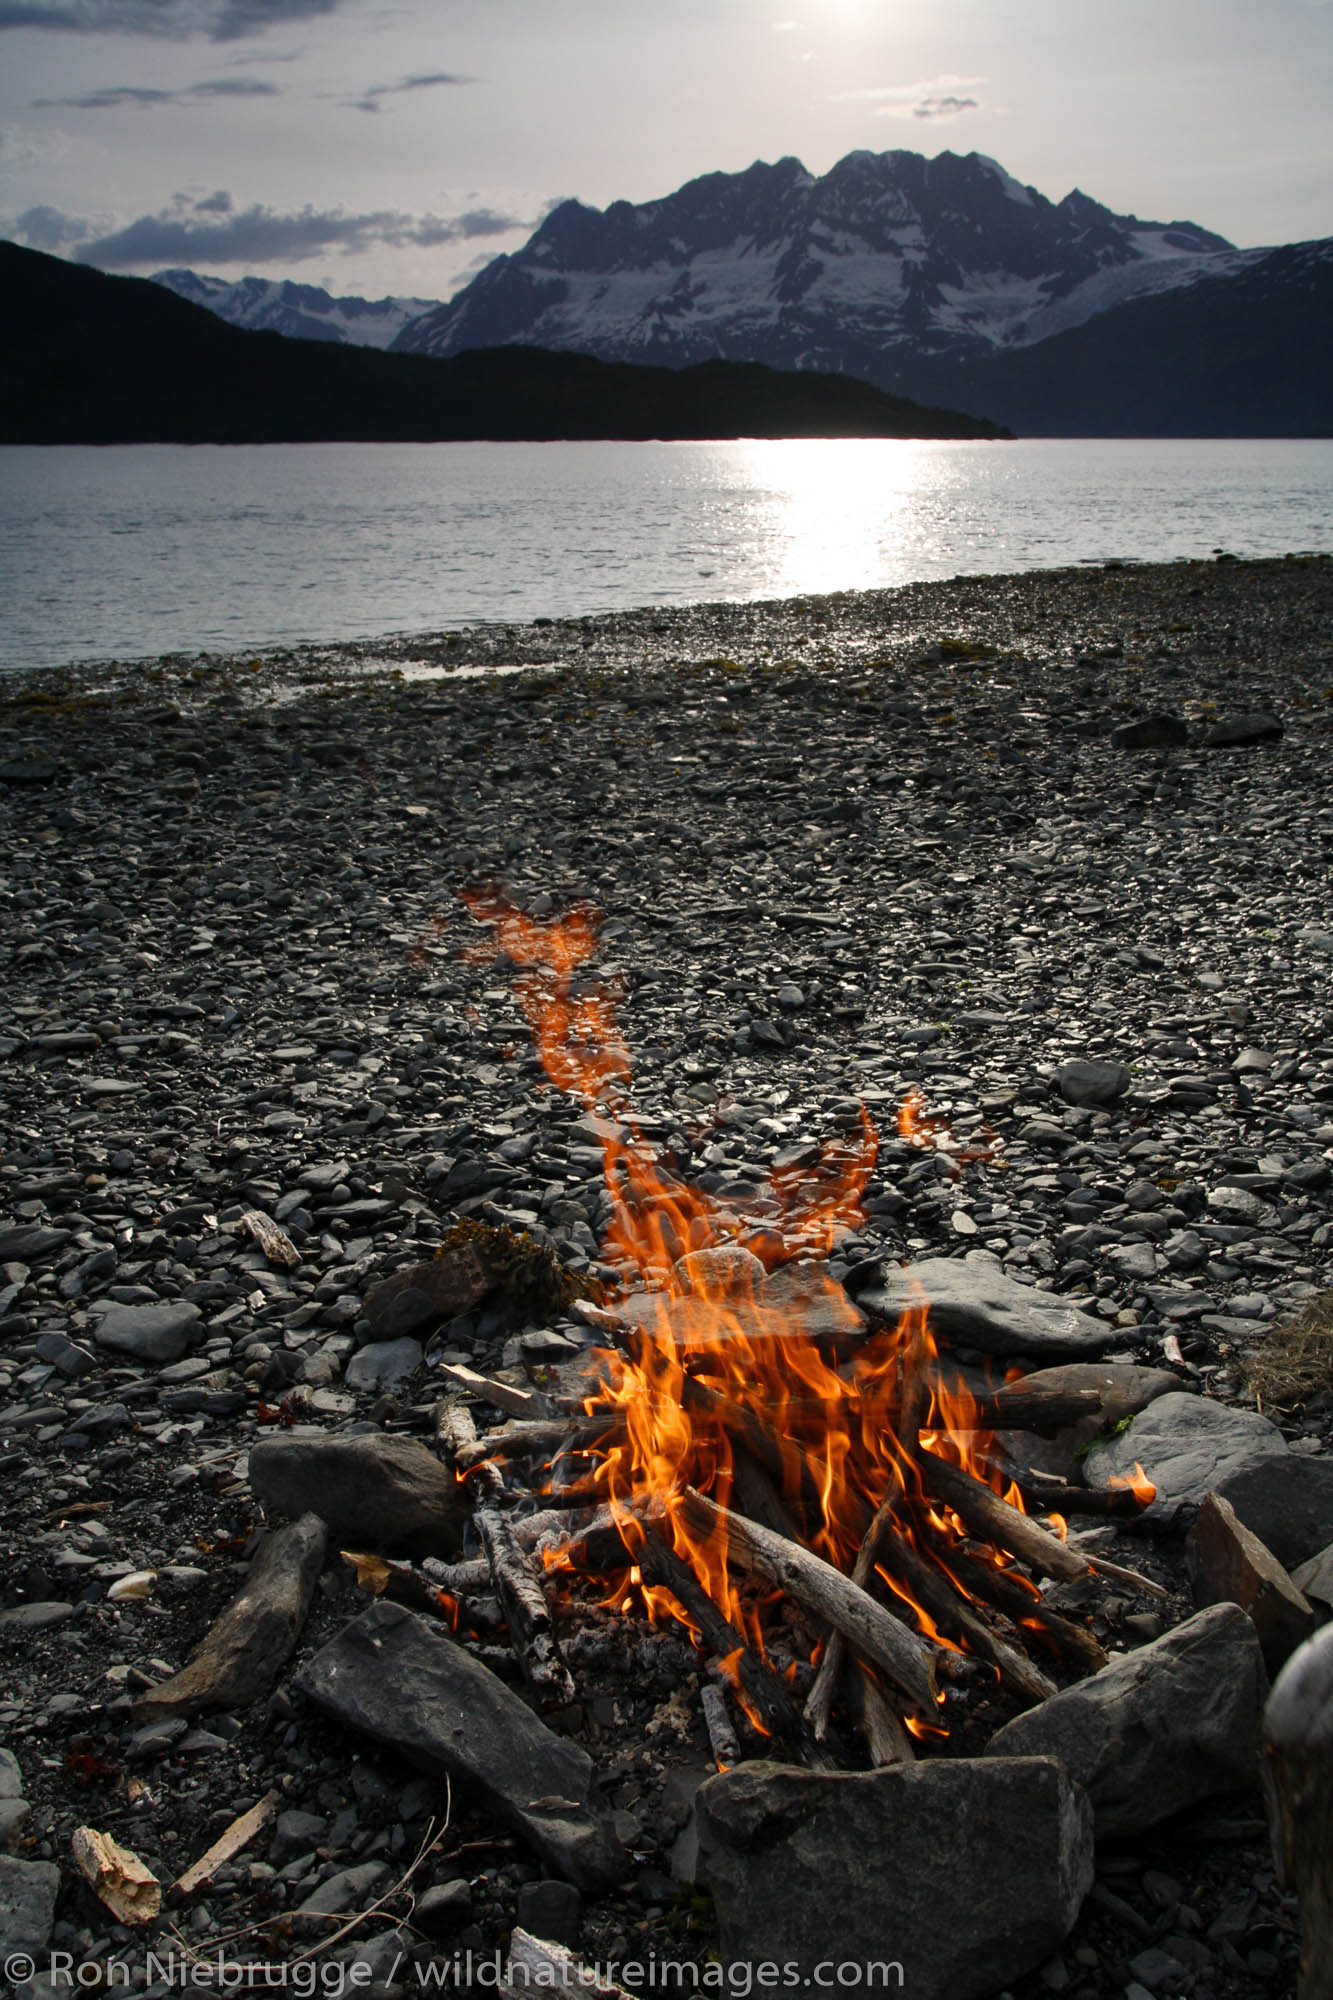 A campfire on the beach, Barry Arm, Prince William Sound, Chugach National Forest, Alaska.